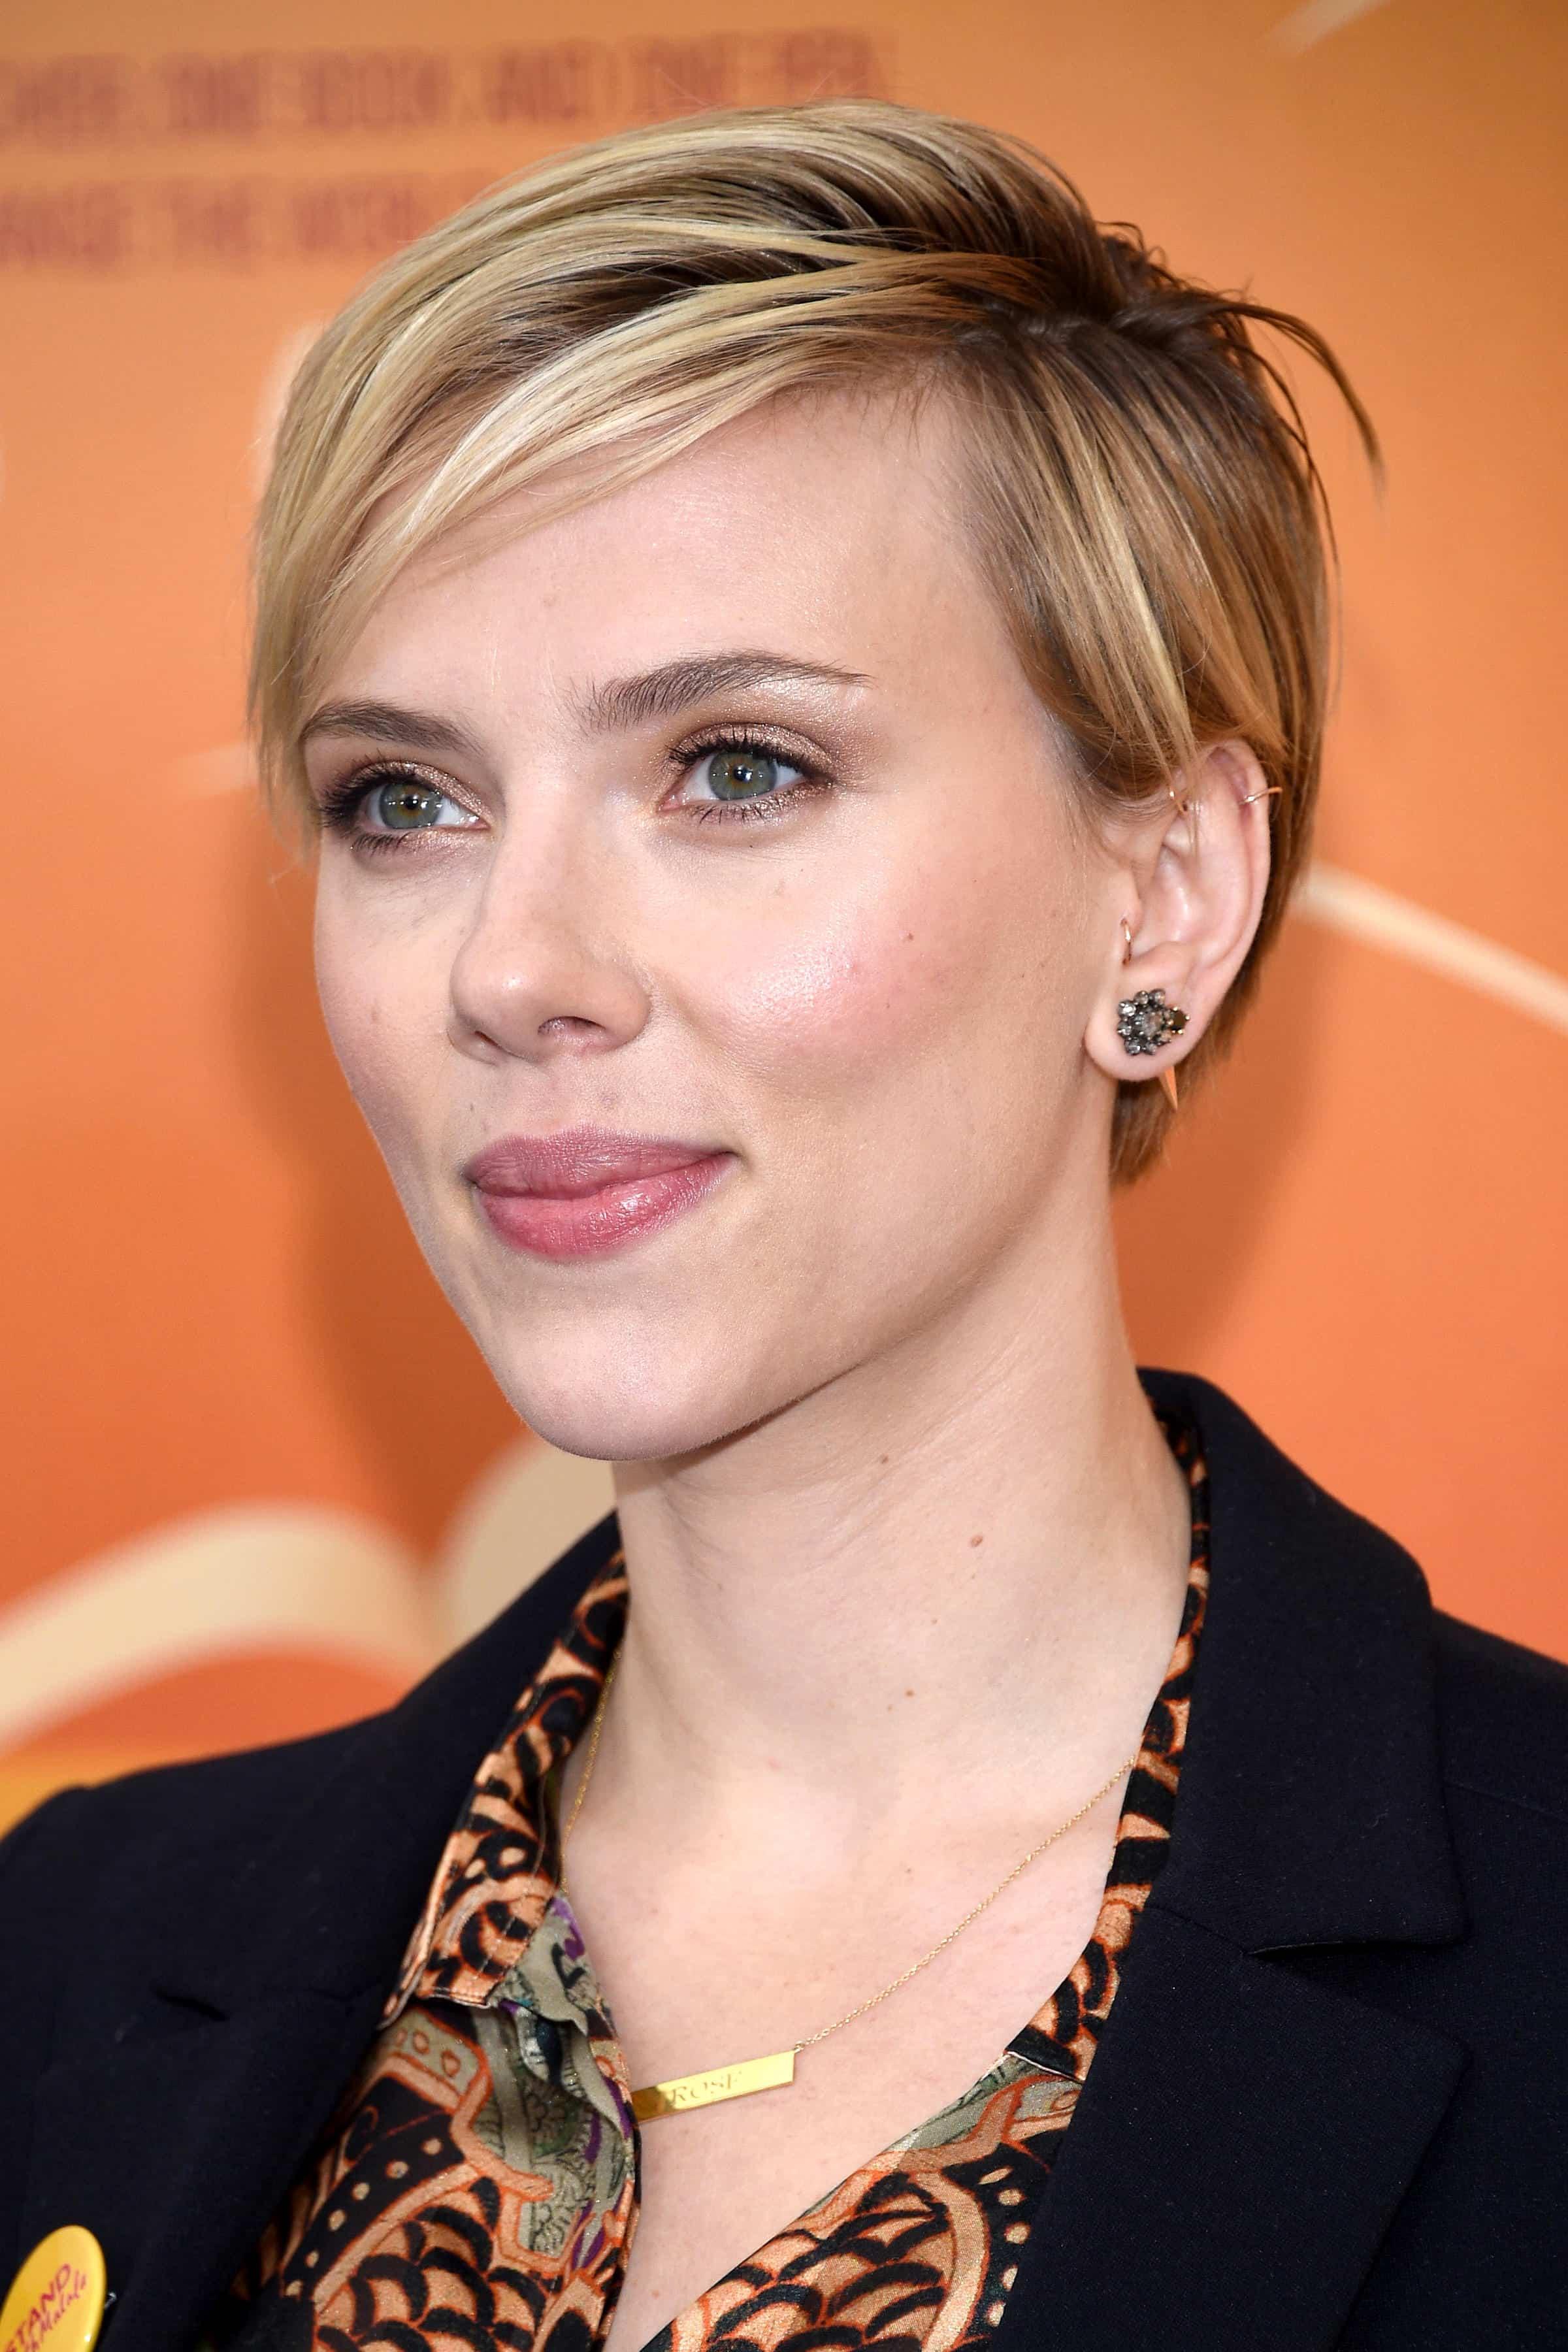 Top 30 Short Hairstyles Celebrities short hairstyles celebrities 18 photo